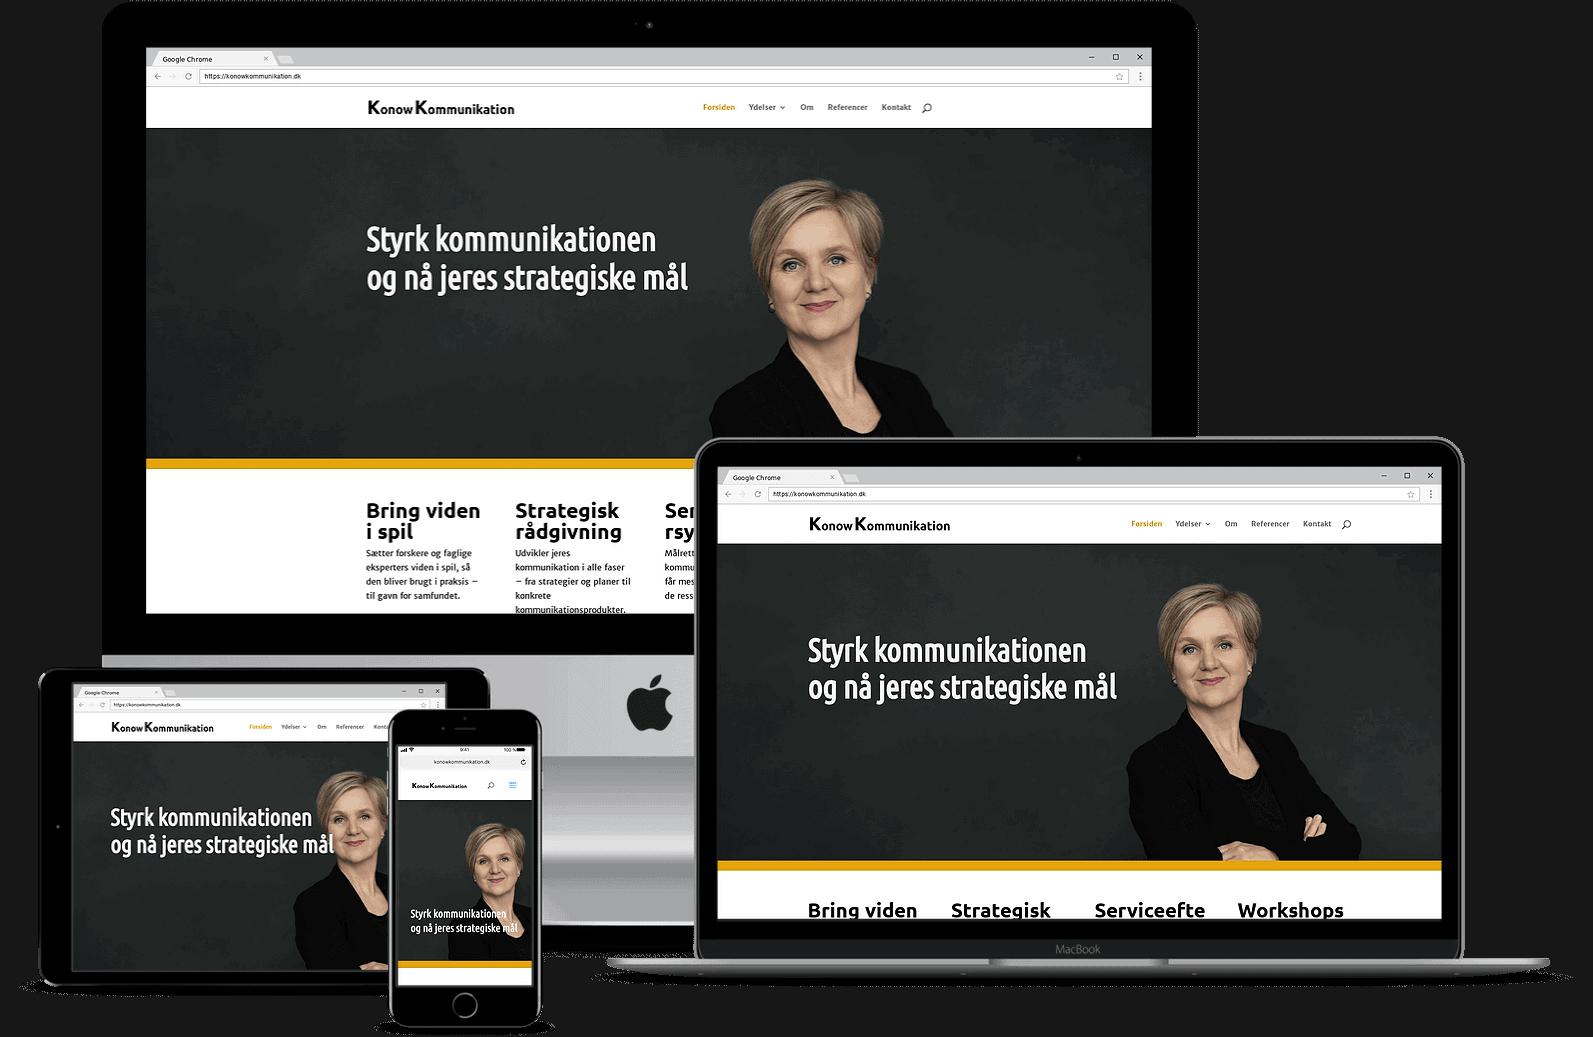 Konow Kommunikation - hjemmeside fra OBBEKÆR design & kommunikation